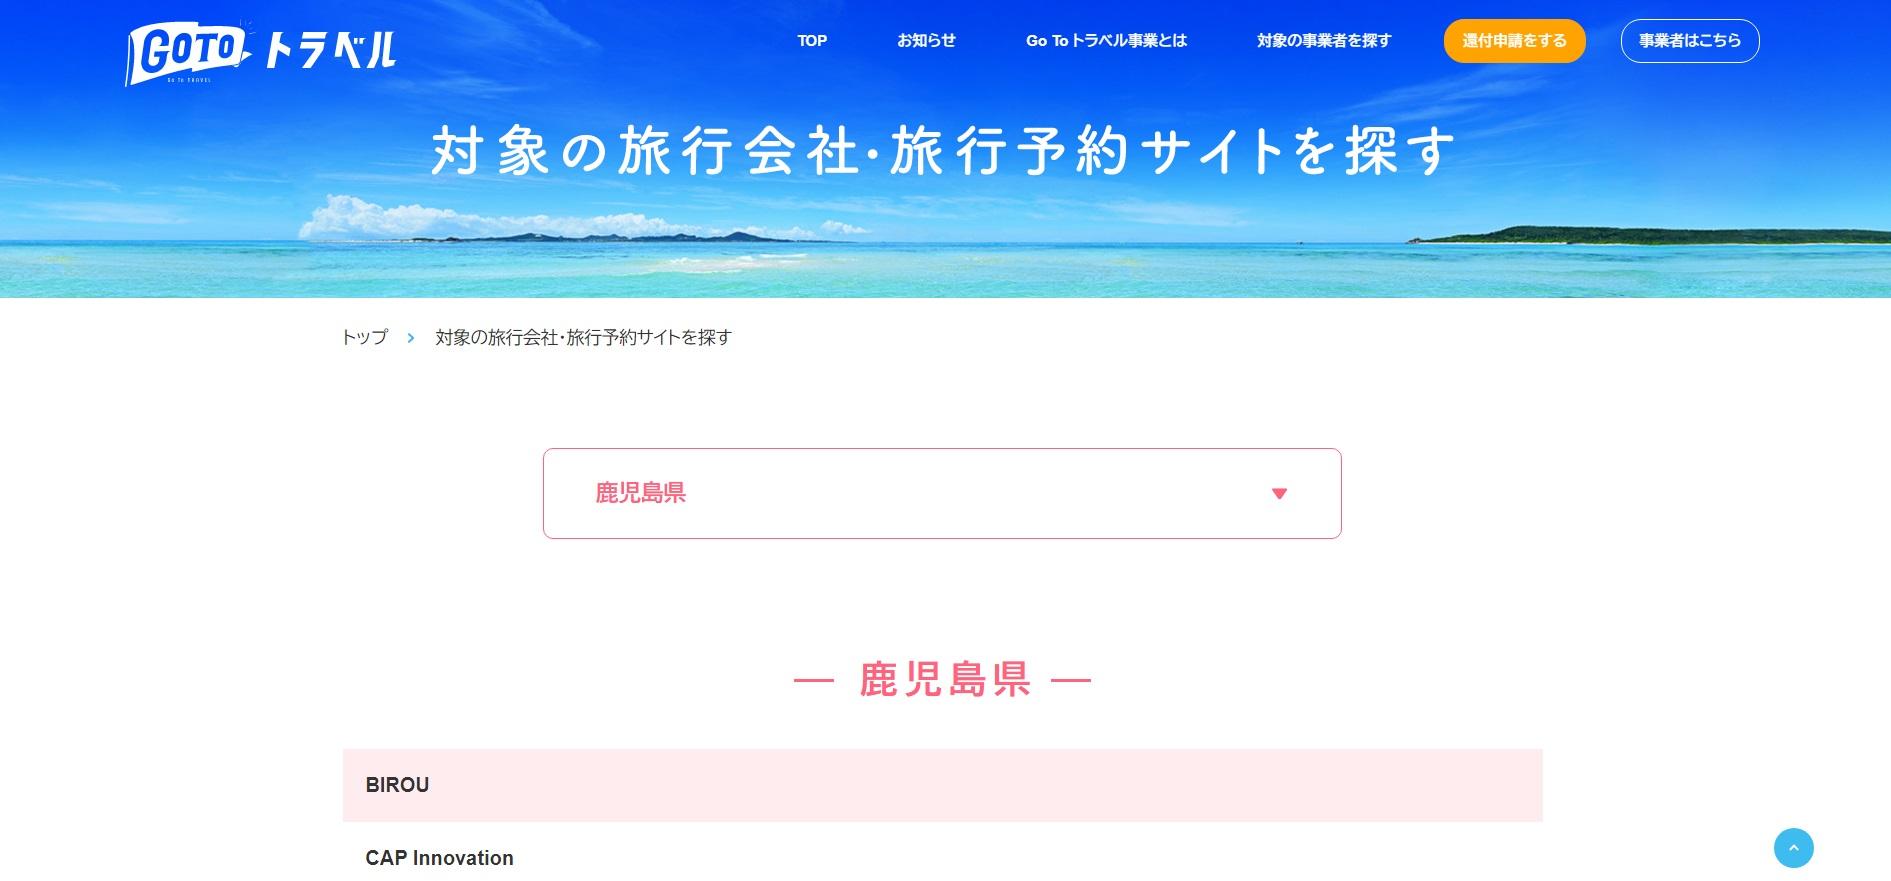 GO TOトラベルキャンペーンで対象の旅行会社・旅行予約サイト(宿泊事業者)を探して予約する方法!(鹿児島県) イメージ画像